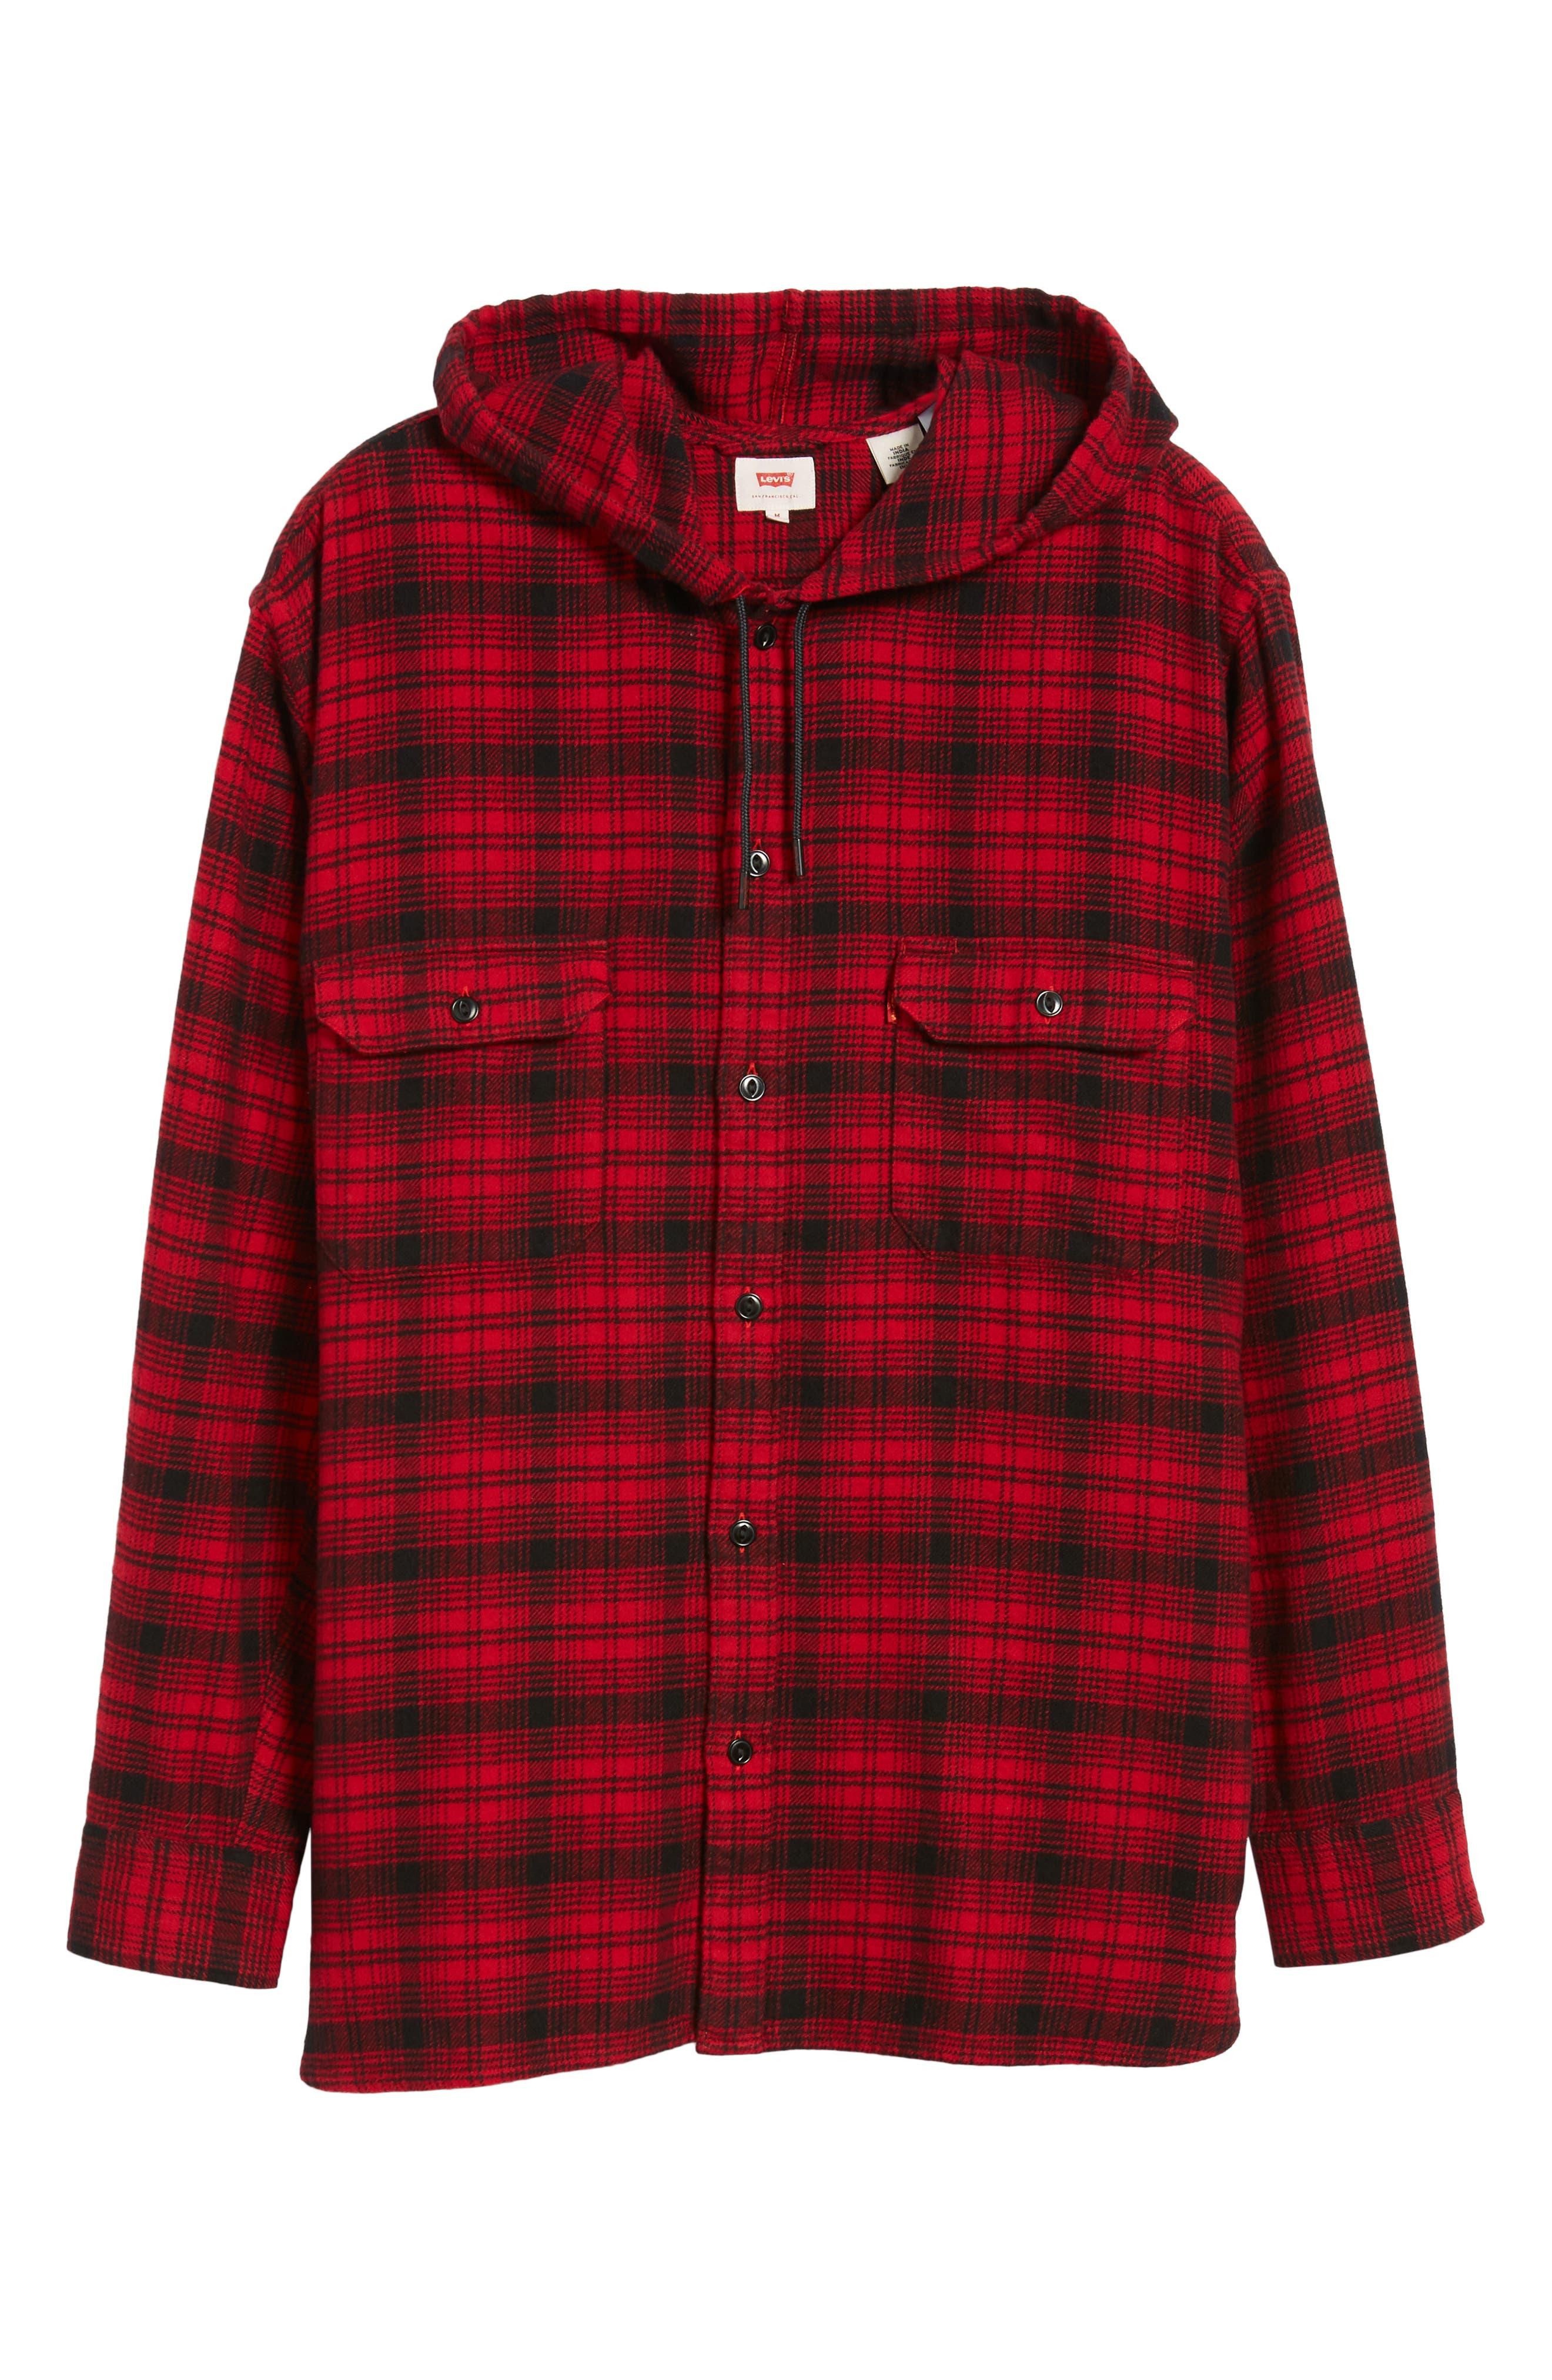 x Justin Timberlake Hooded Flannel Worker Shirt,                             Alternate thumbnail 7, color,                             SERVAL CRIMSON